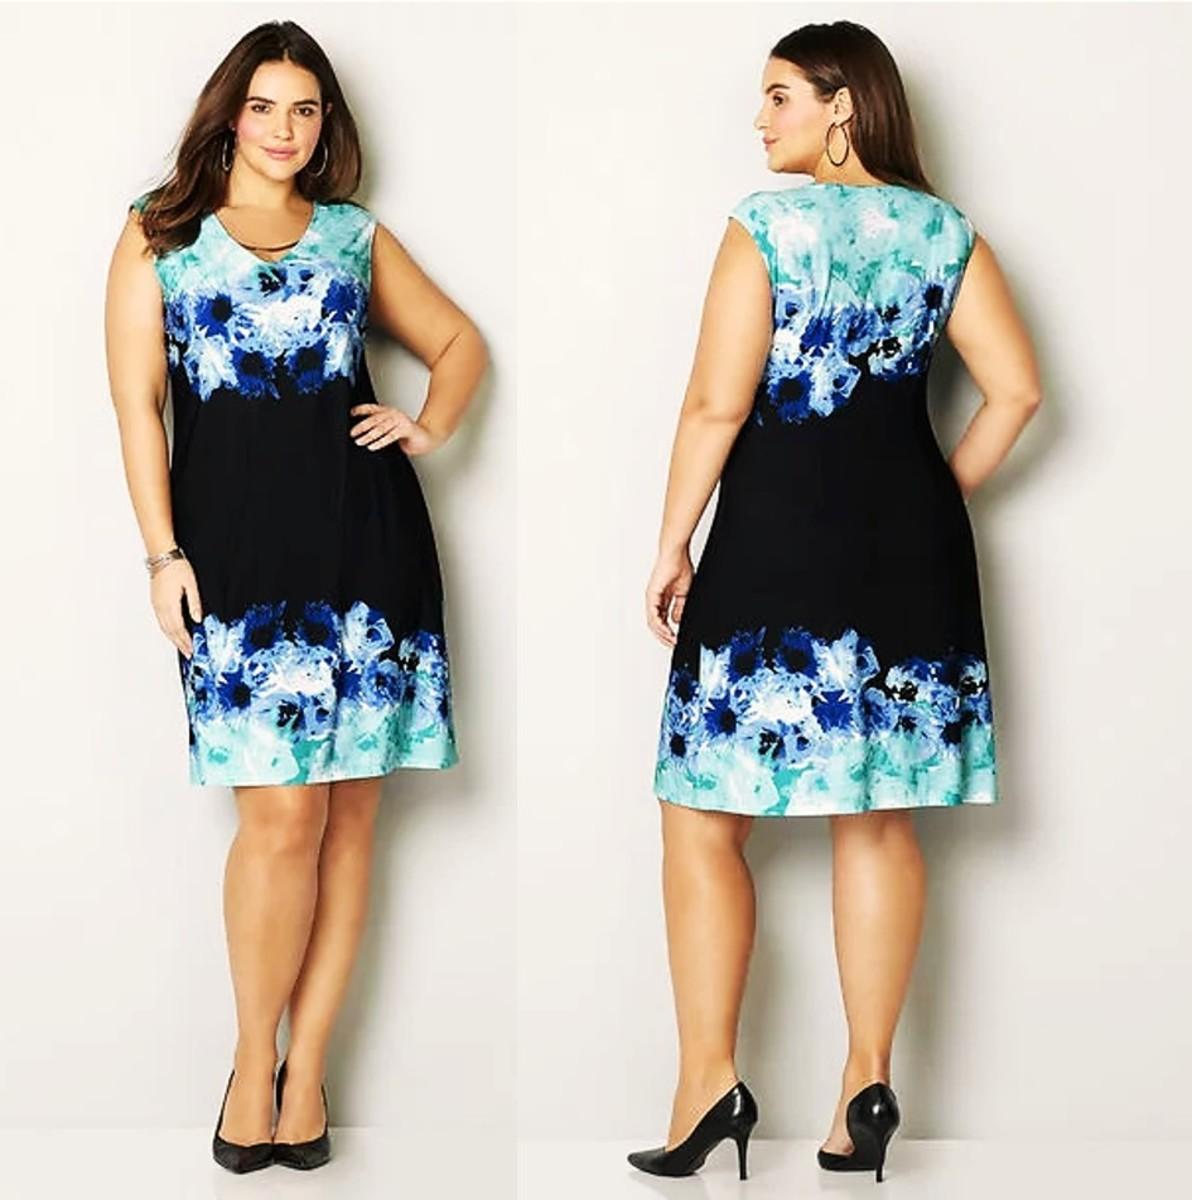 feminine sheath dress with beautiful border of flowers at the neck and hemline